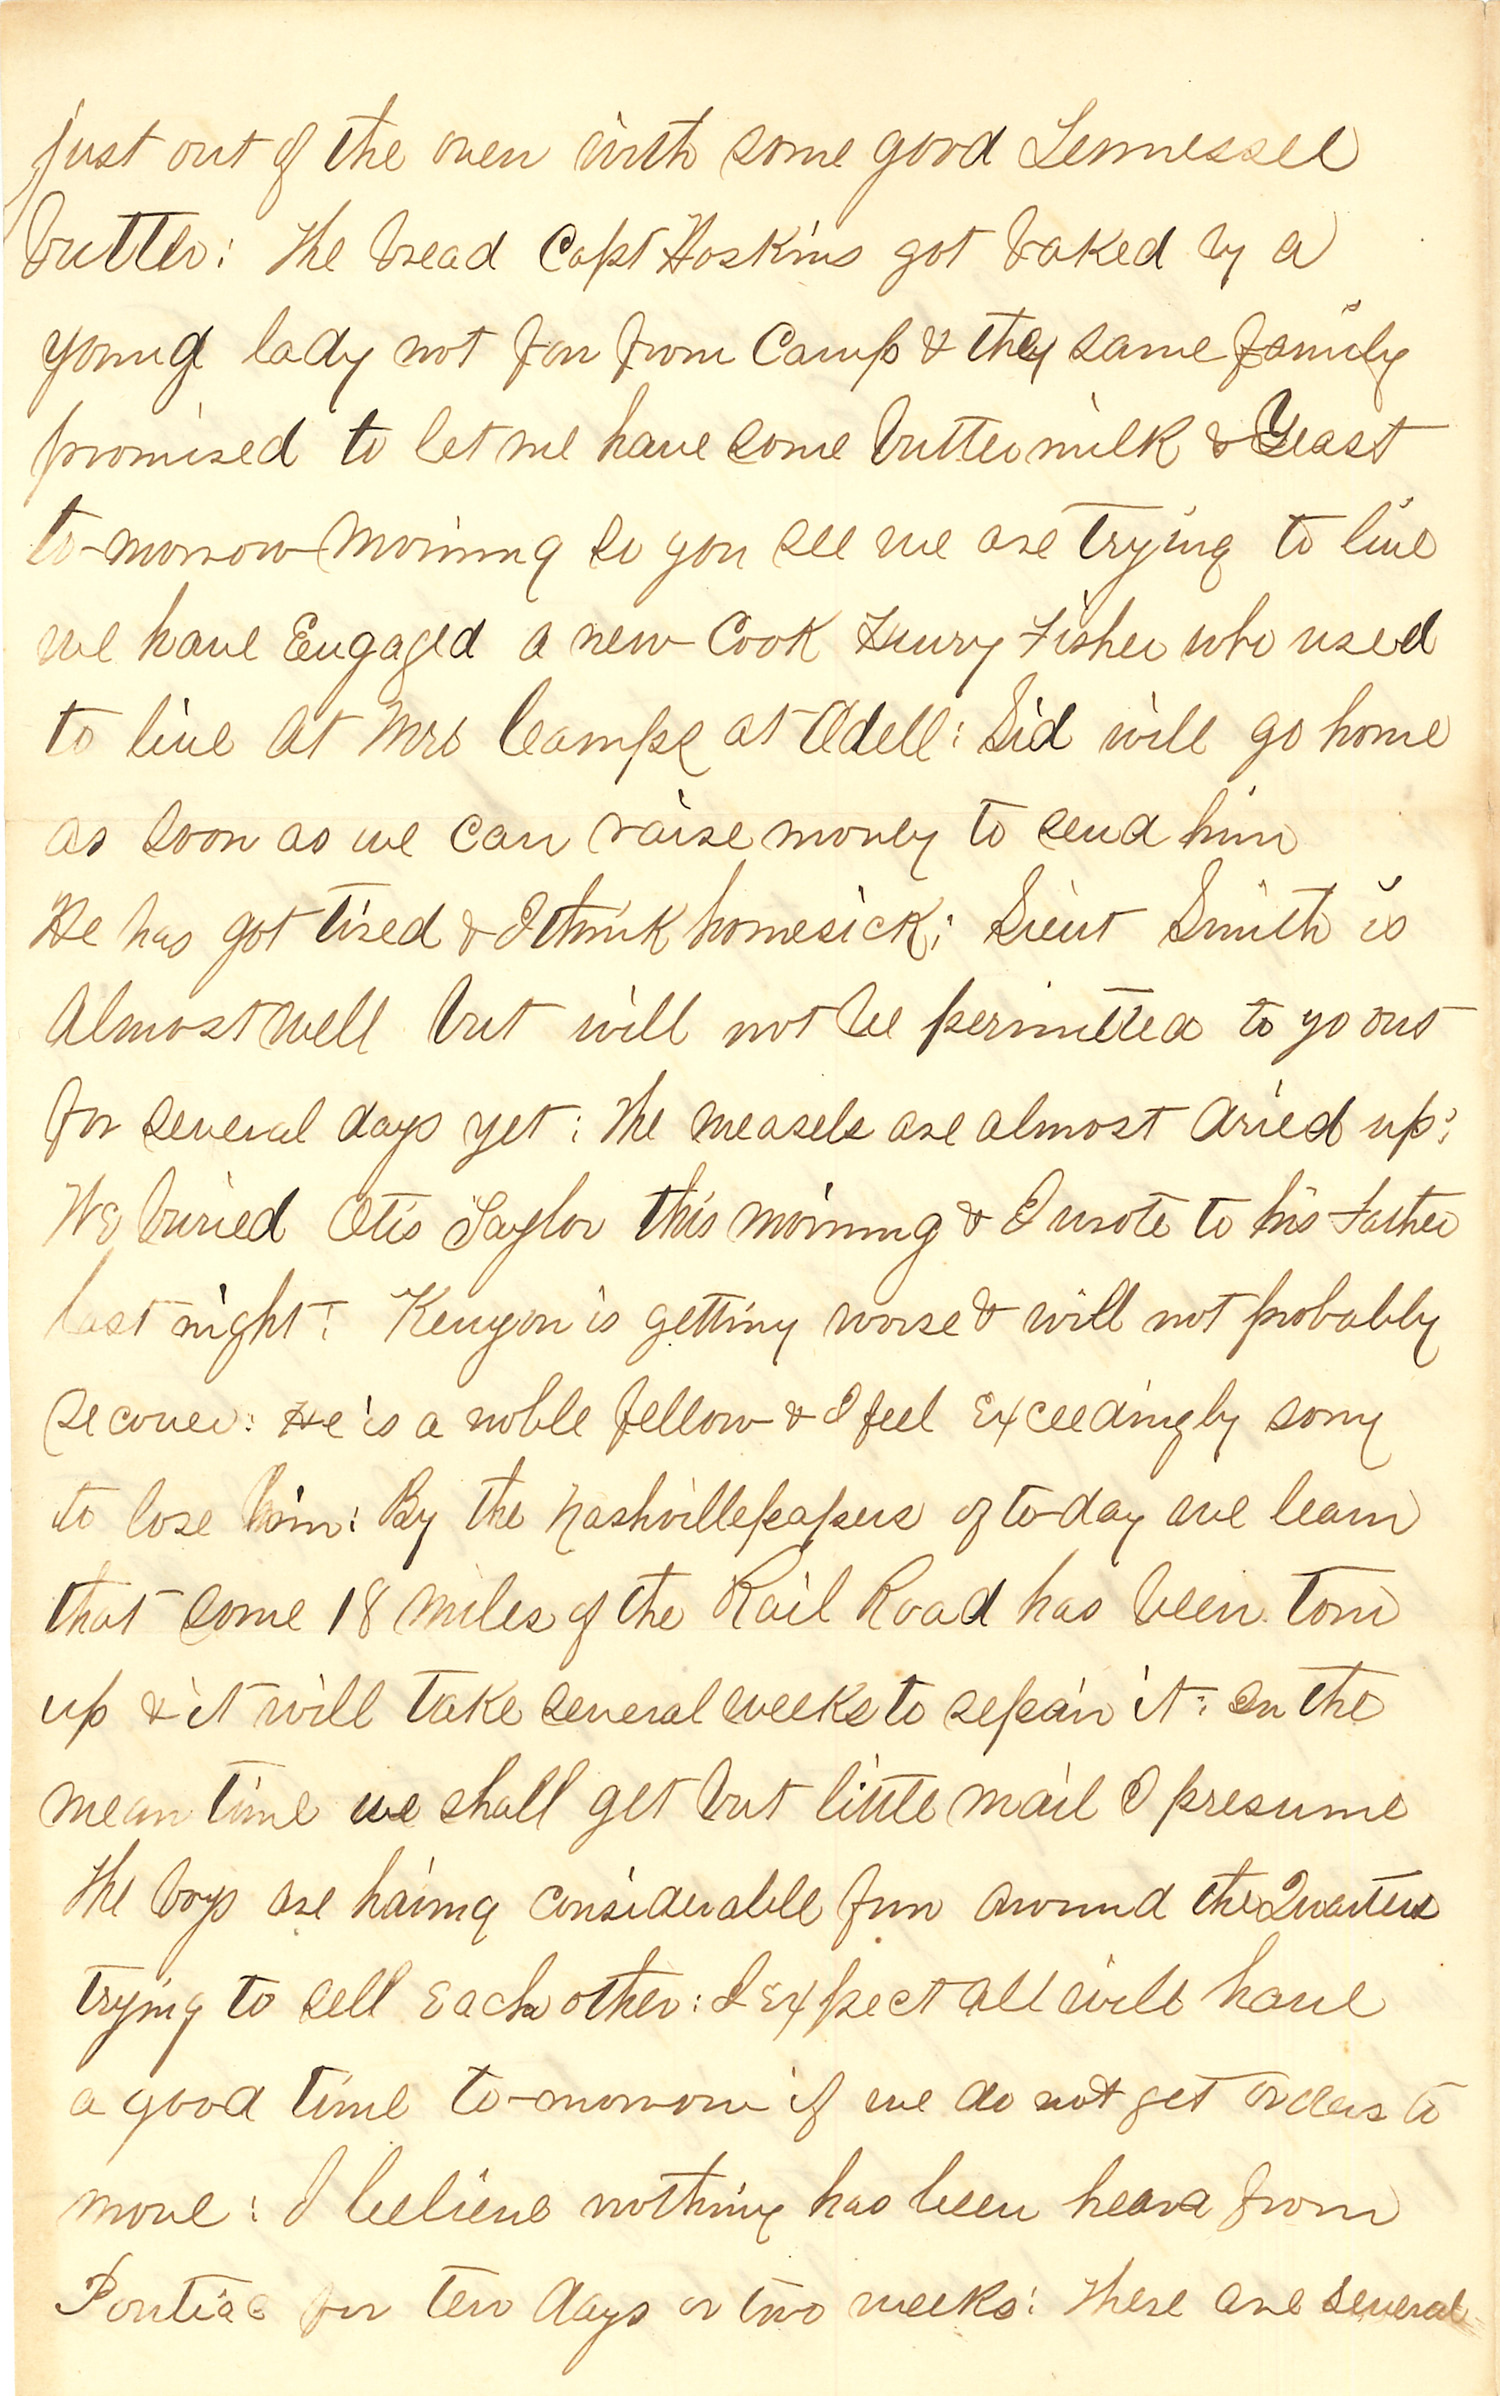 Joseph Culver Letter, December 31, 1862, Page 2